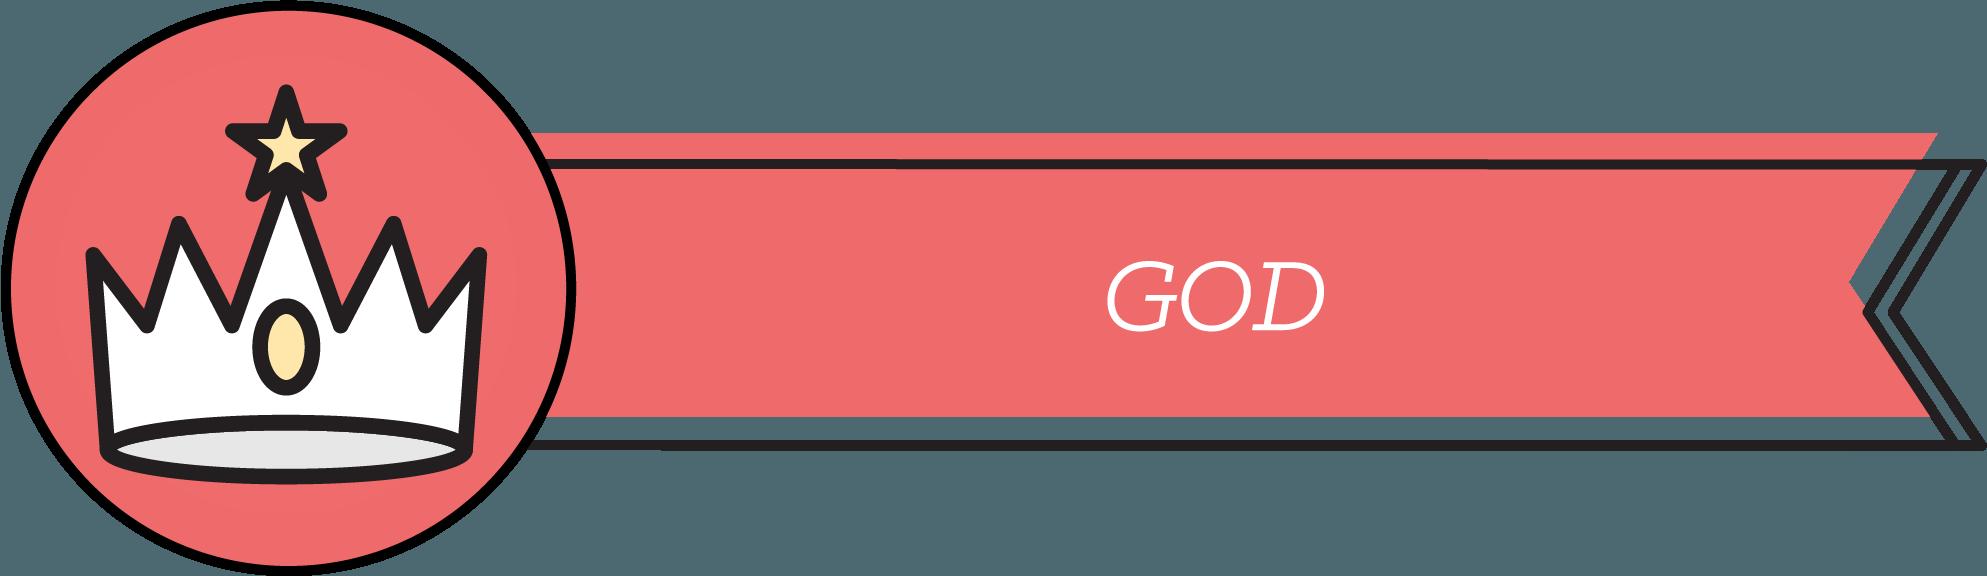 God Concept